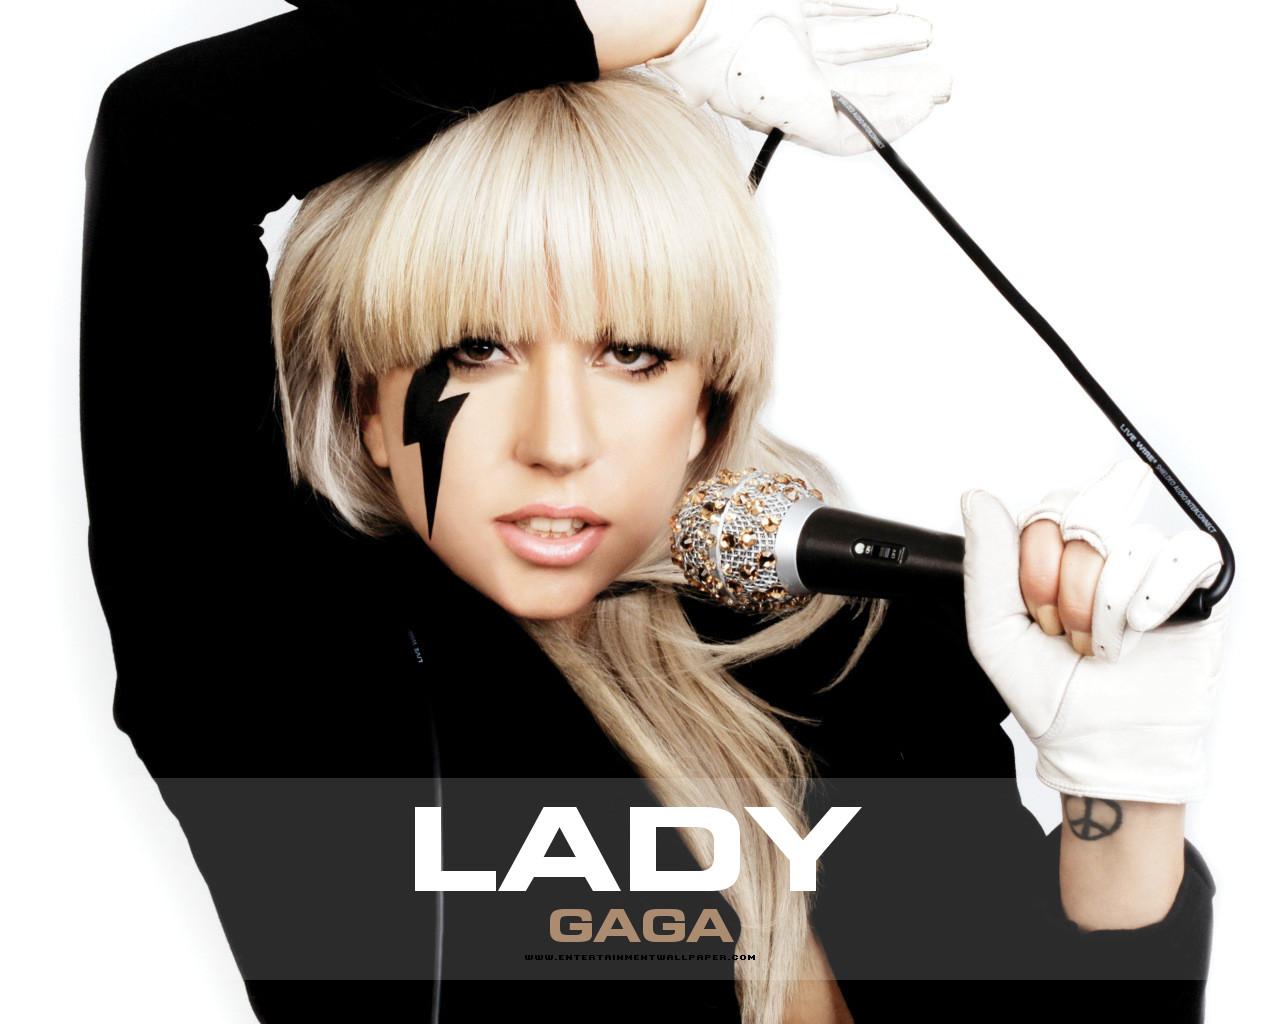 http://2.bp.blogspot.com/_Q7VA_Mt8Sng/S8fOJJvYraI/AAAAAAAAA9U/LjVVYIVHGA8/s1600/lady_gaga02.jpg